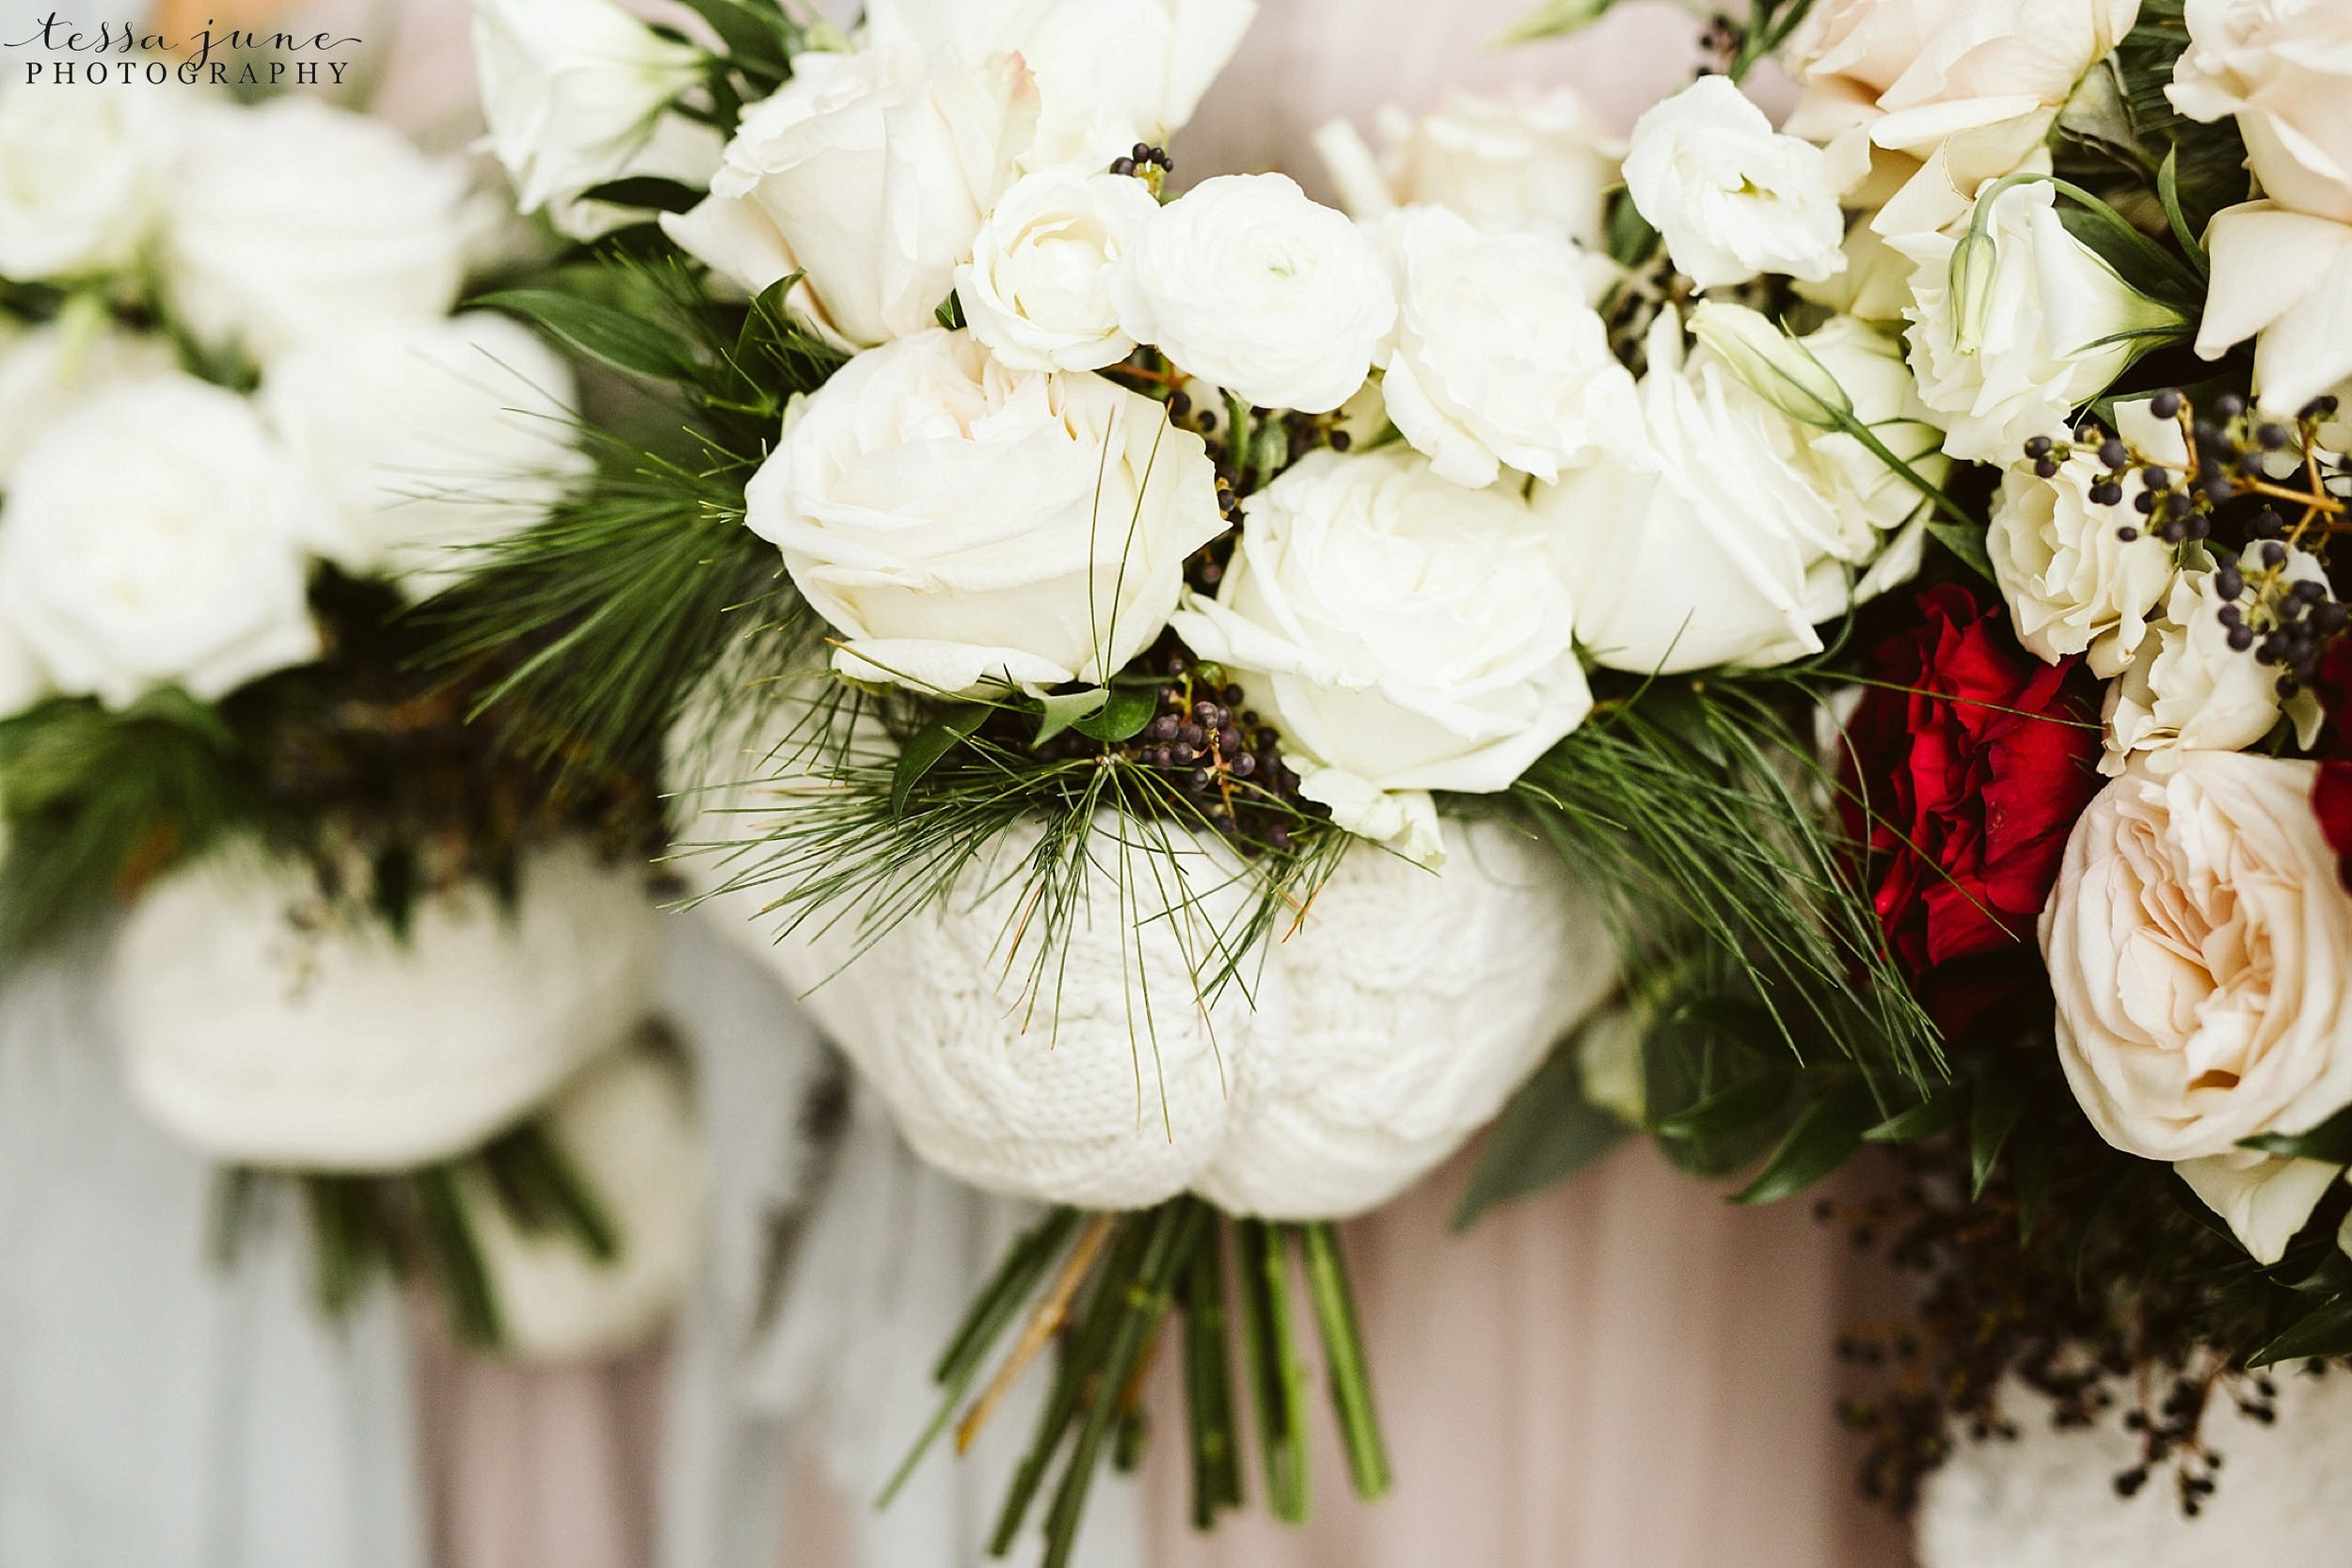 minneapolis-event-center-winter-romantic-snow-wedding-december-113.jpg